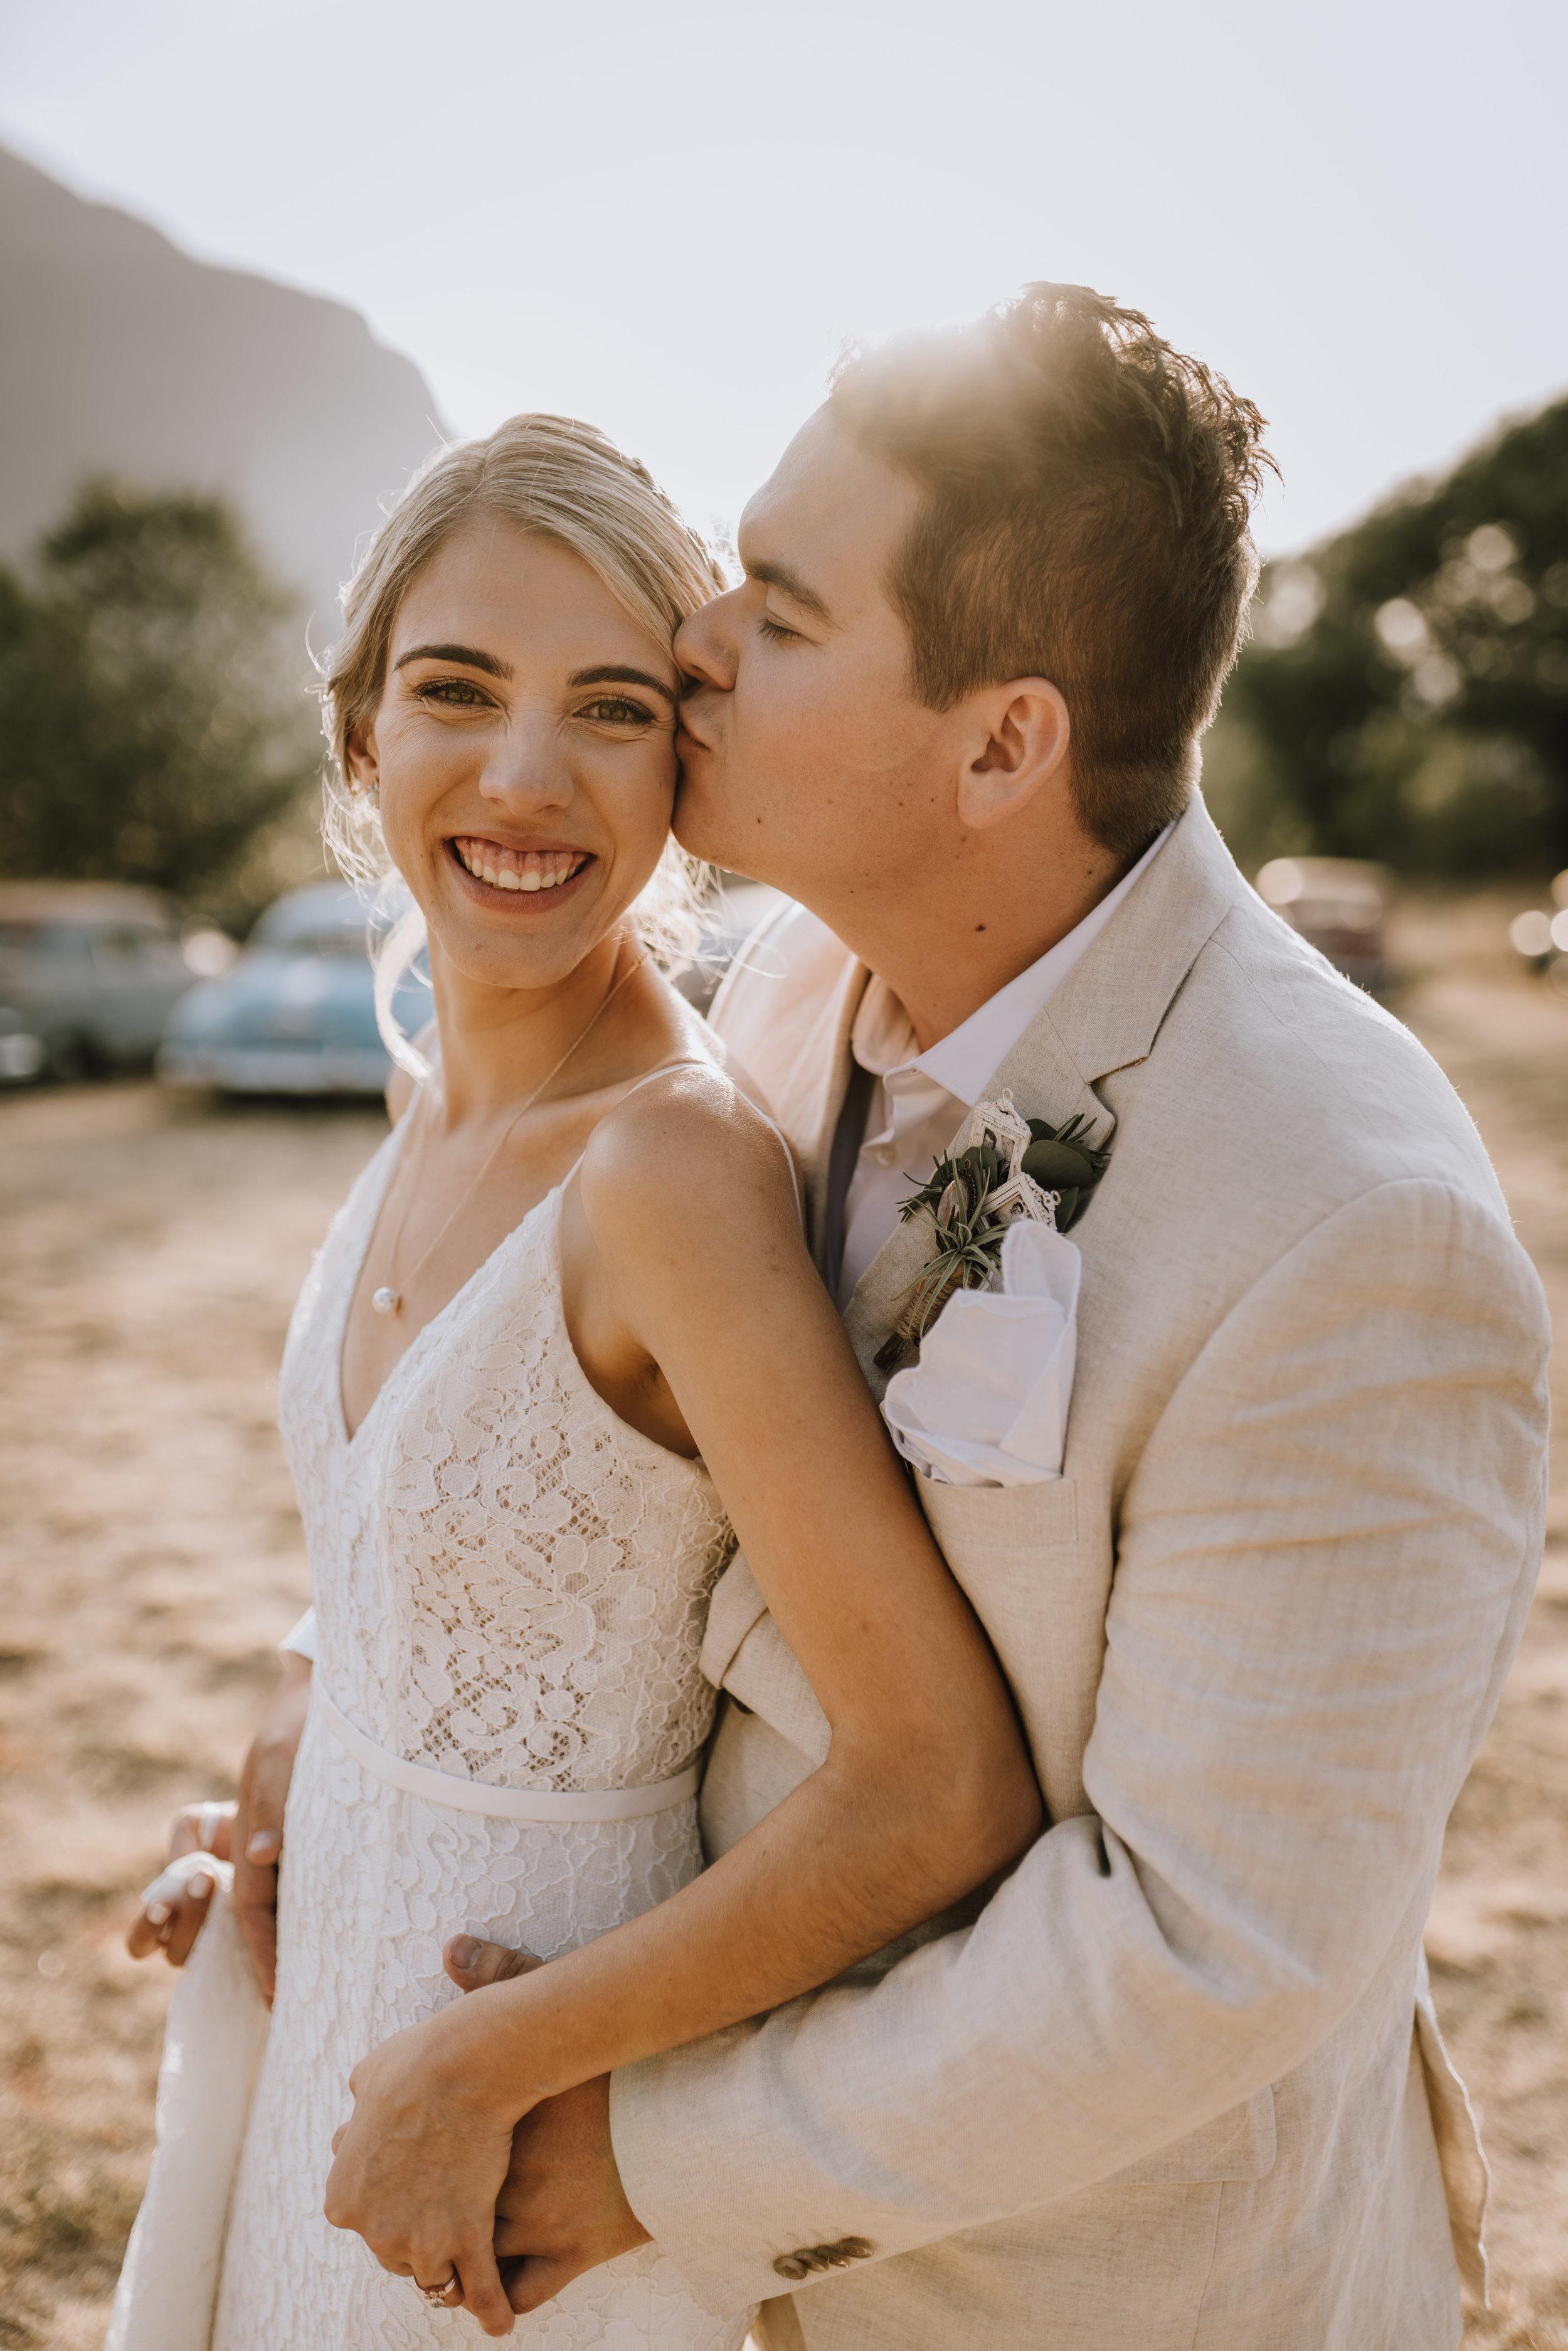 chase-rheann-okanagan-wedding-photographer-36.jpg